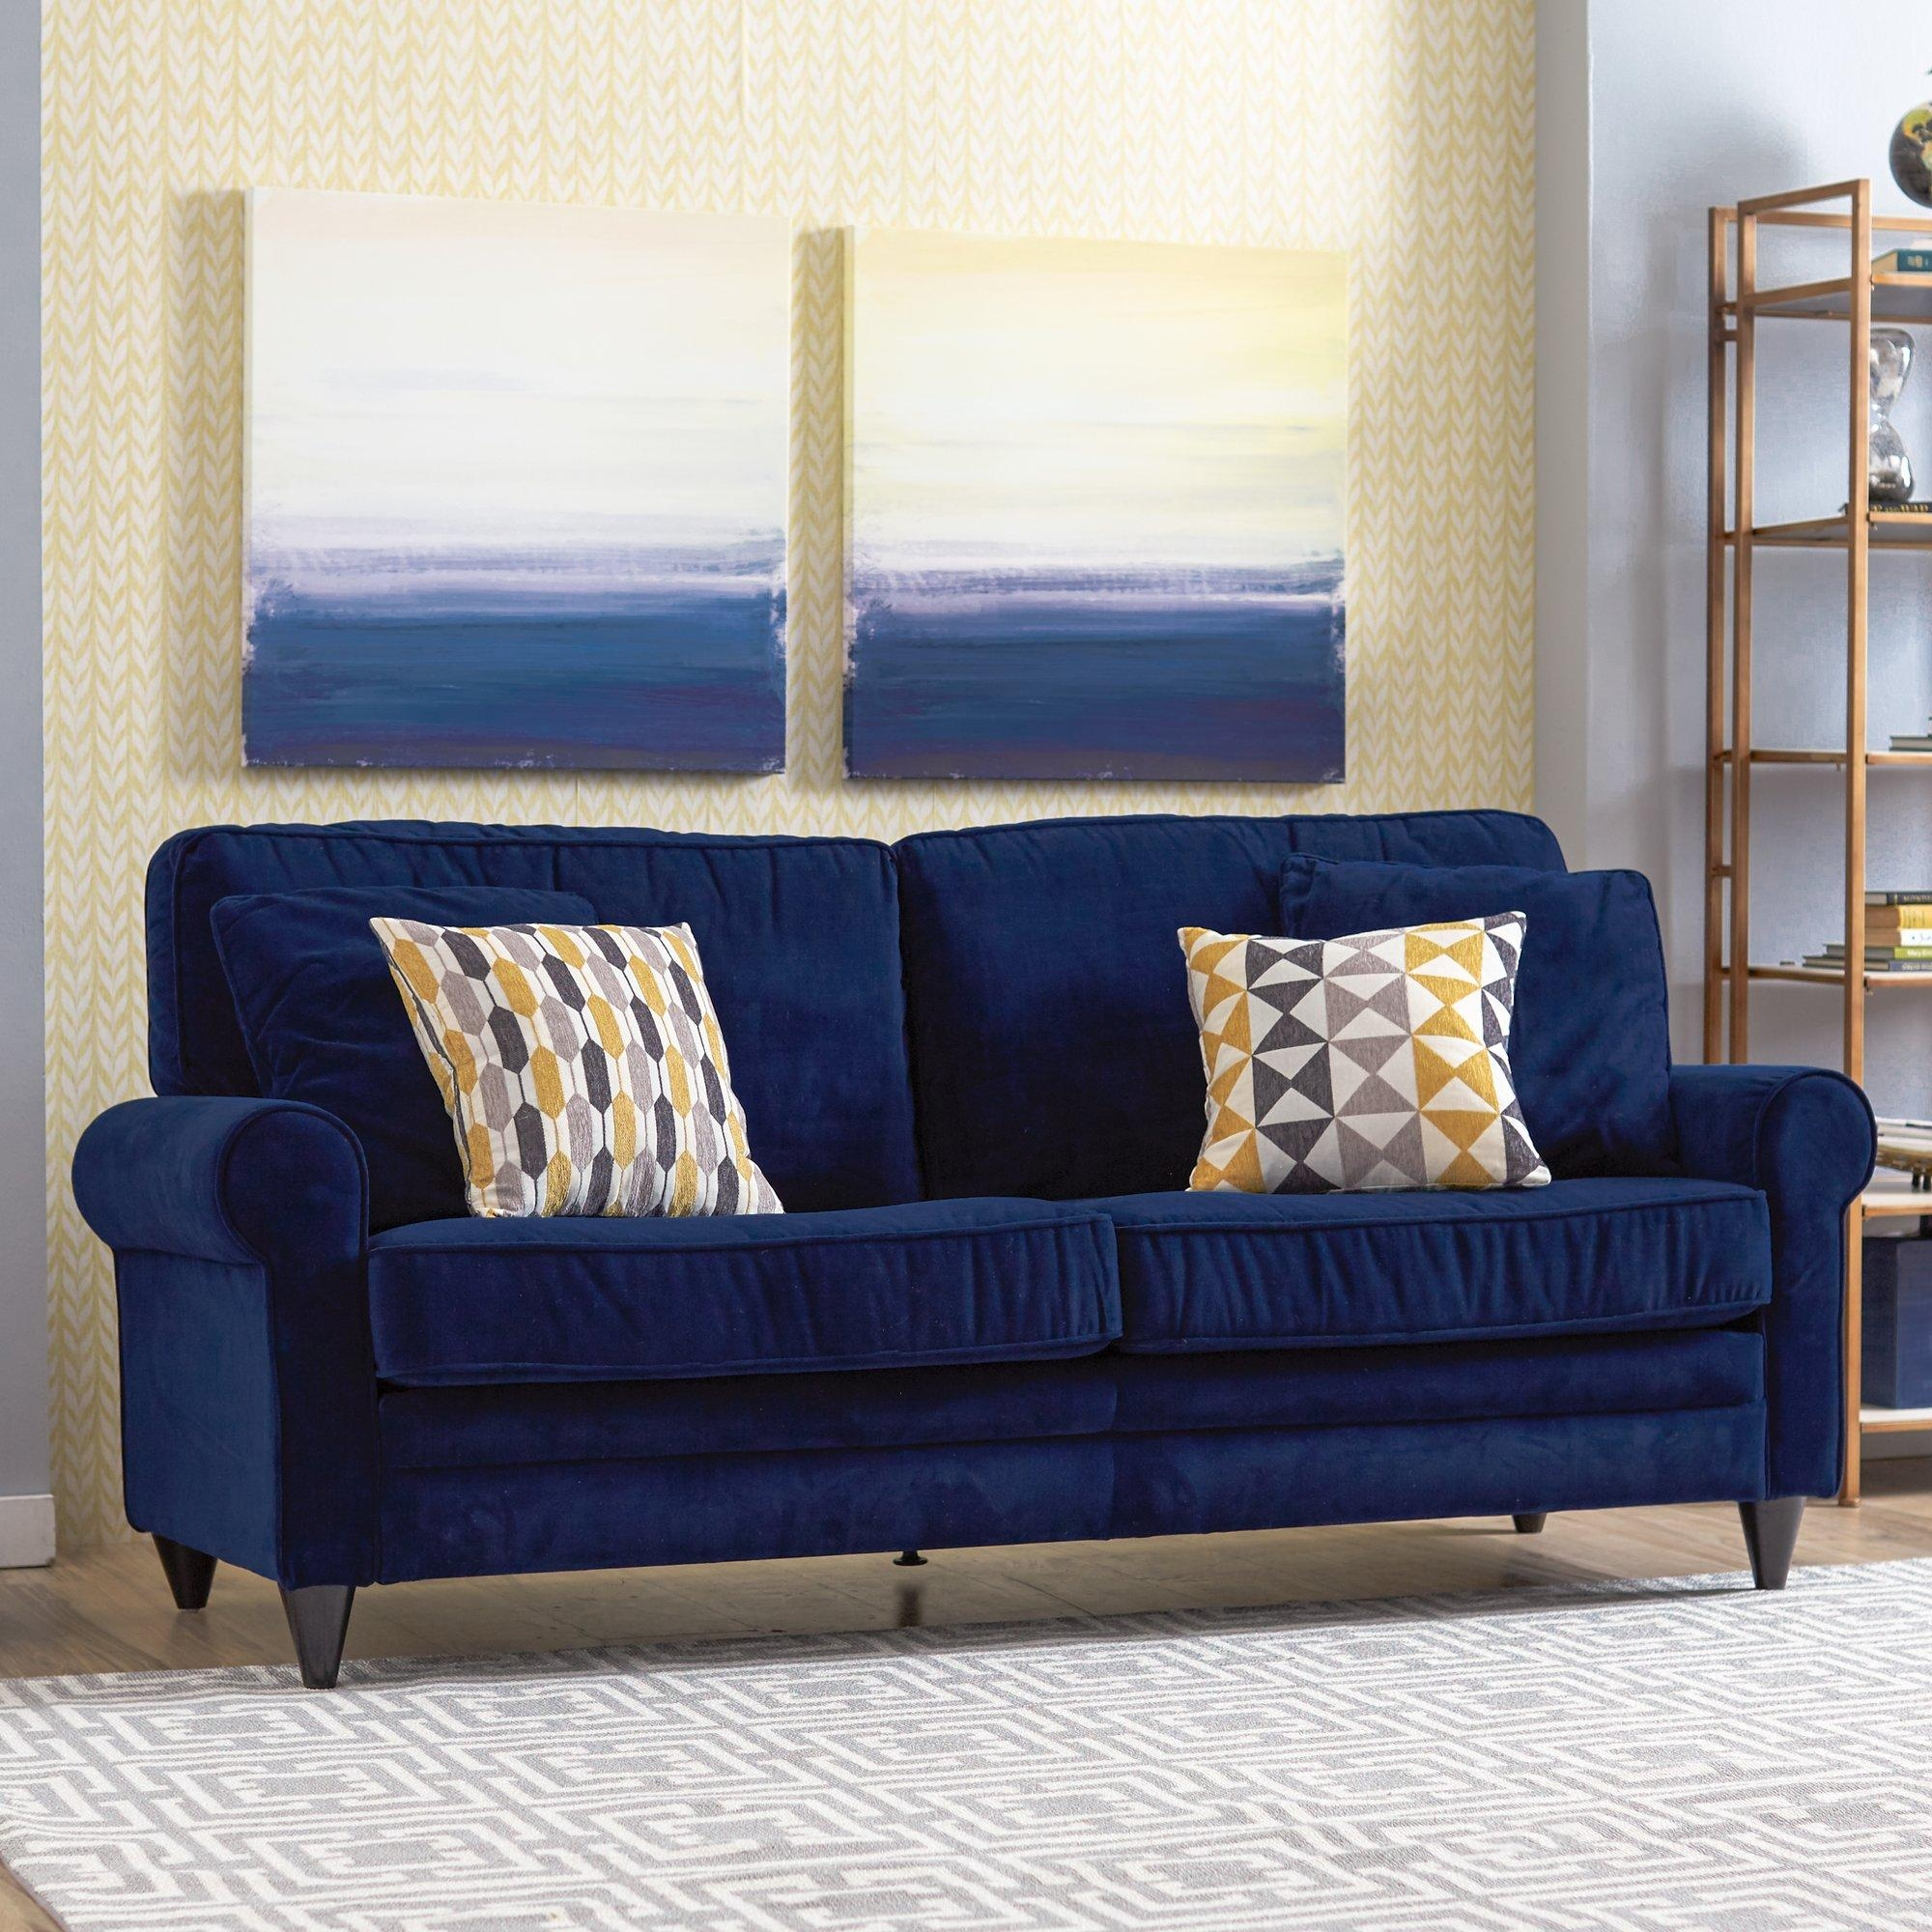 Blue Denim Sofa | Wayfair | Tehranmix Decoration Pertaining To Blue Denim Sofas (View 9 of 20)